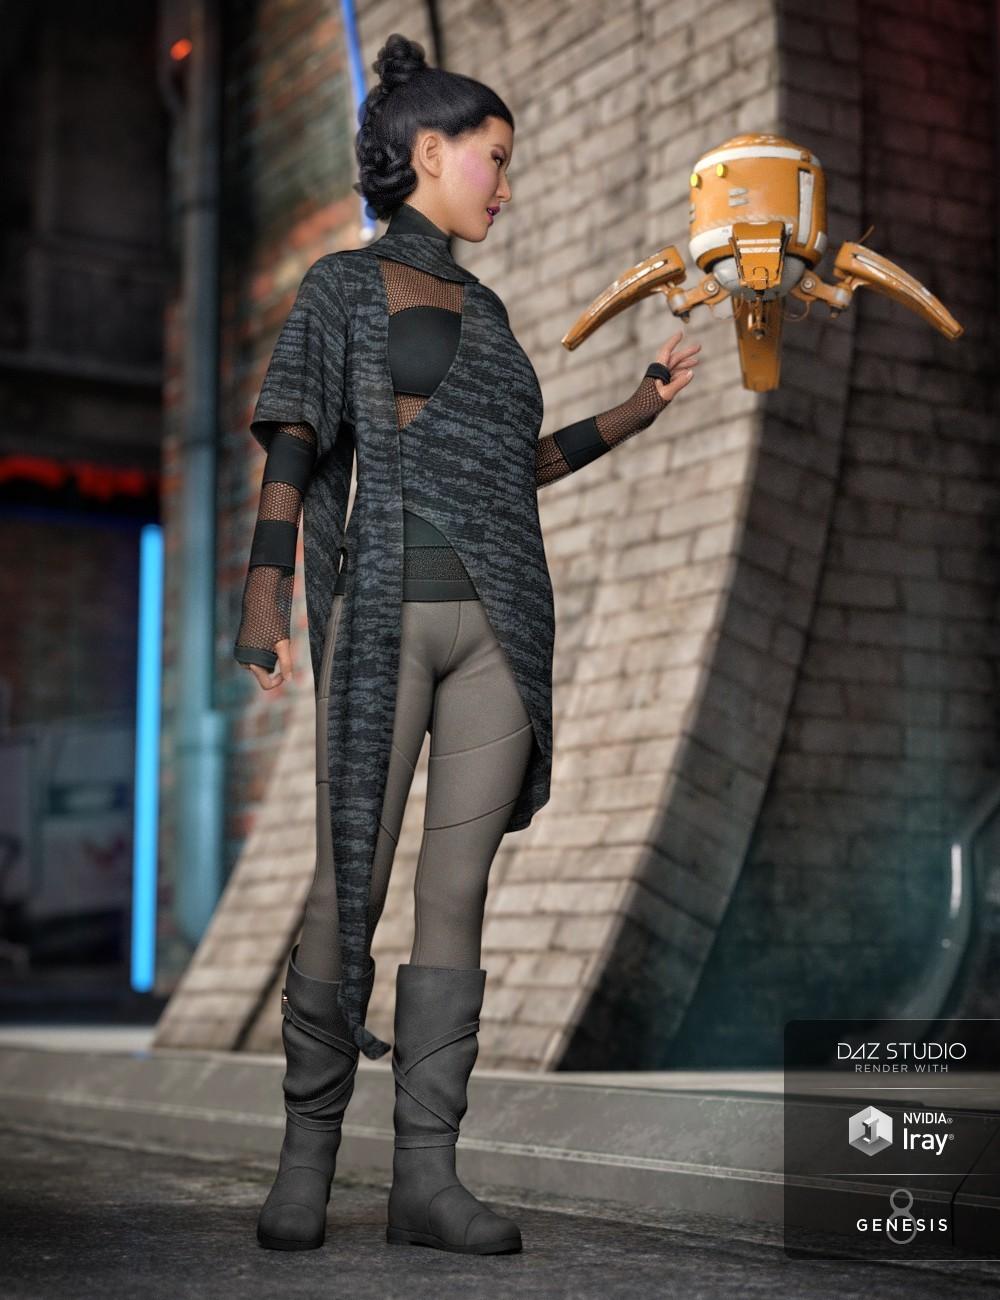 ArtStation - dForce Dystopian Future Outfit for Genesis 8 Females